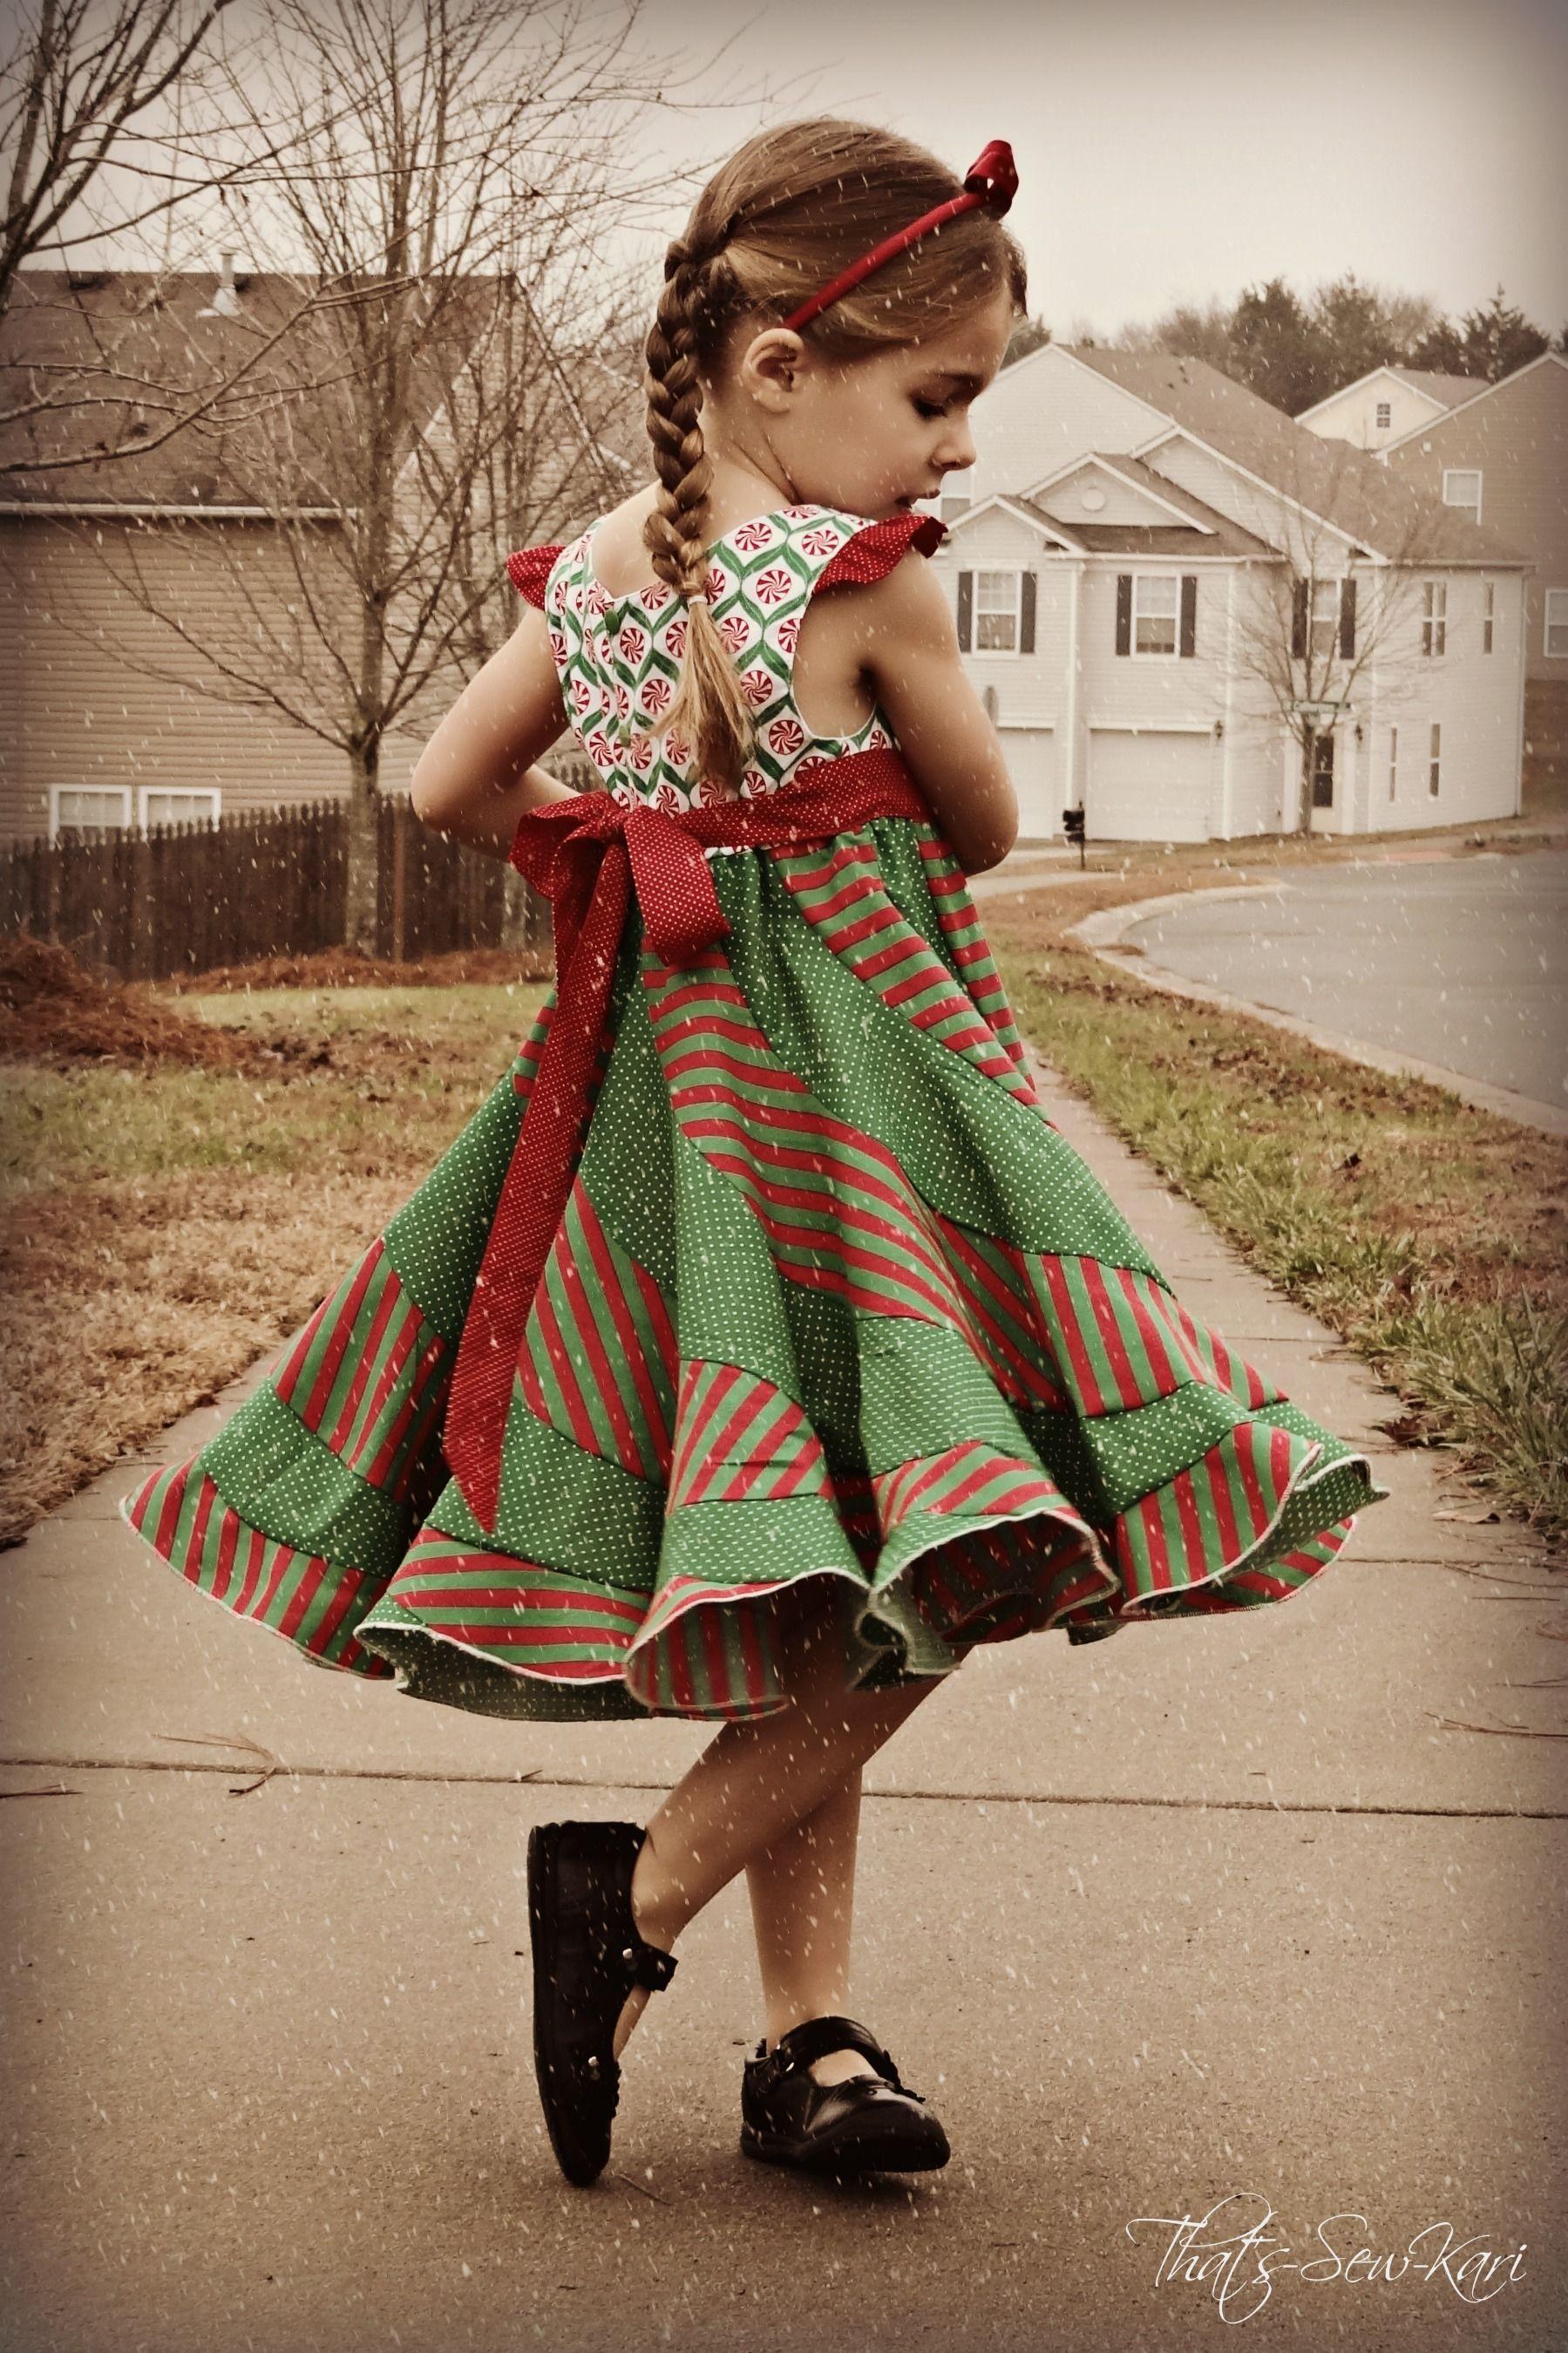 Peppermint Swirl Dress | nähen | Pinterest | Nähen und Kind